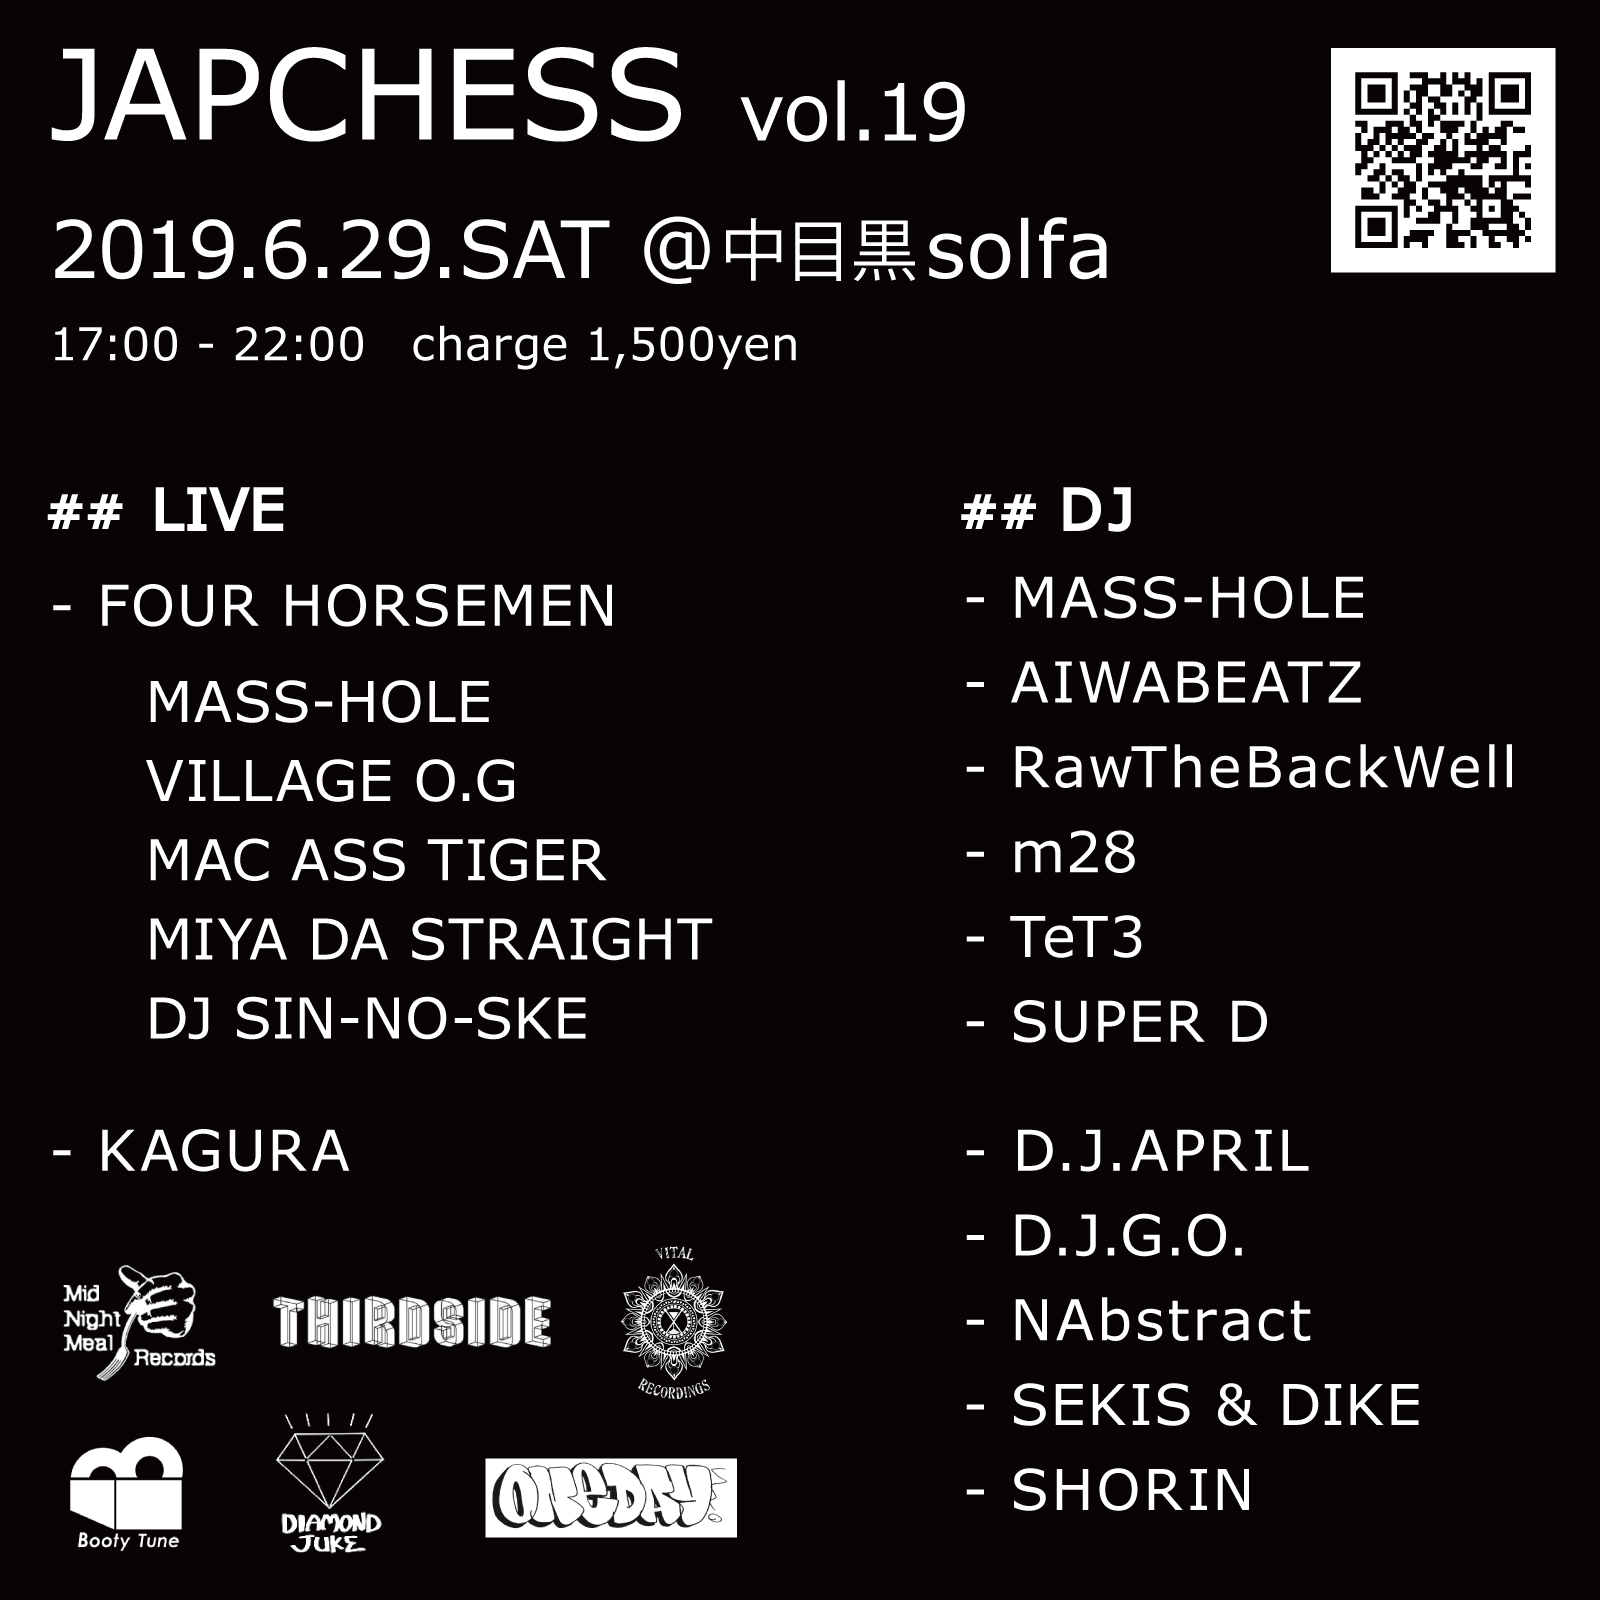 JAPCHESS Vol19